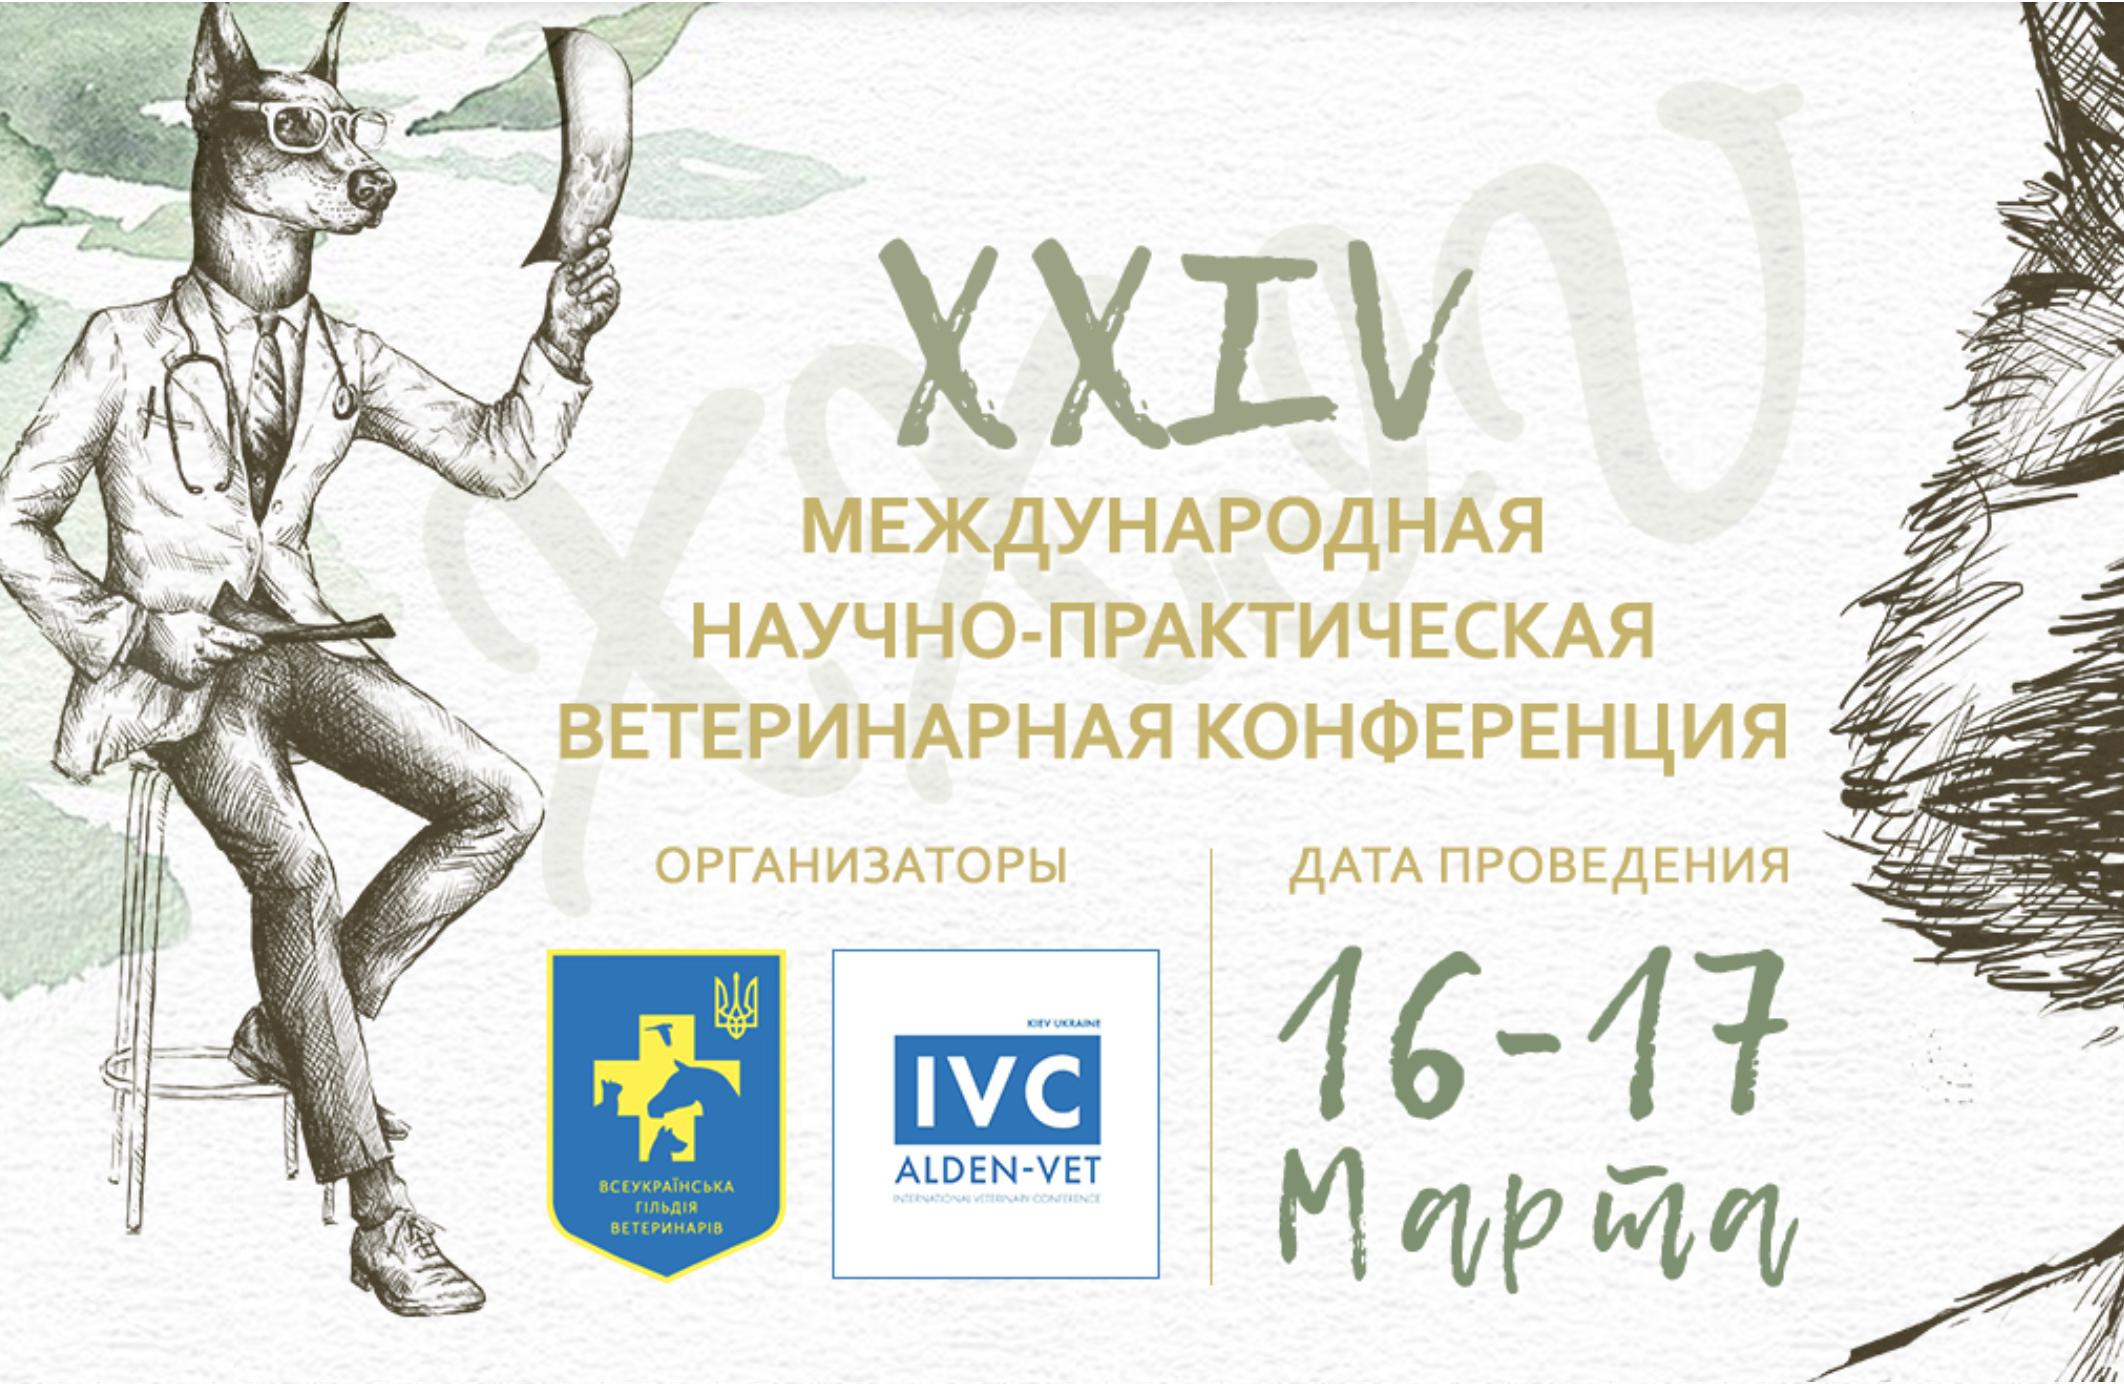 XXIV научная конференция  IVC 2019